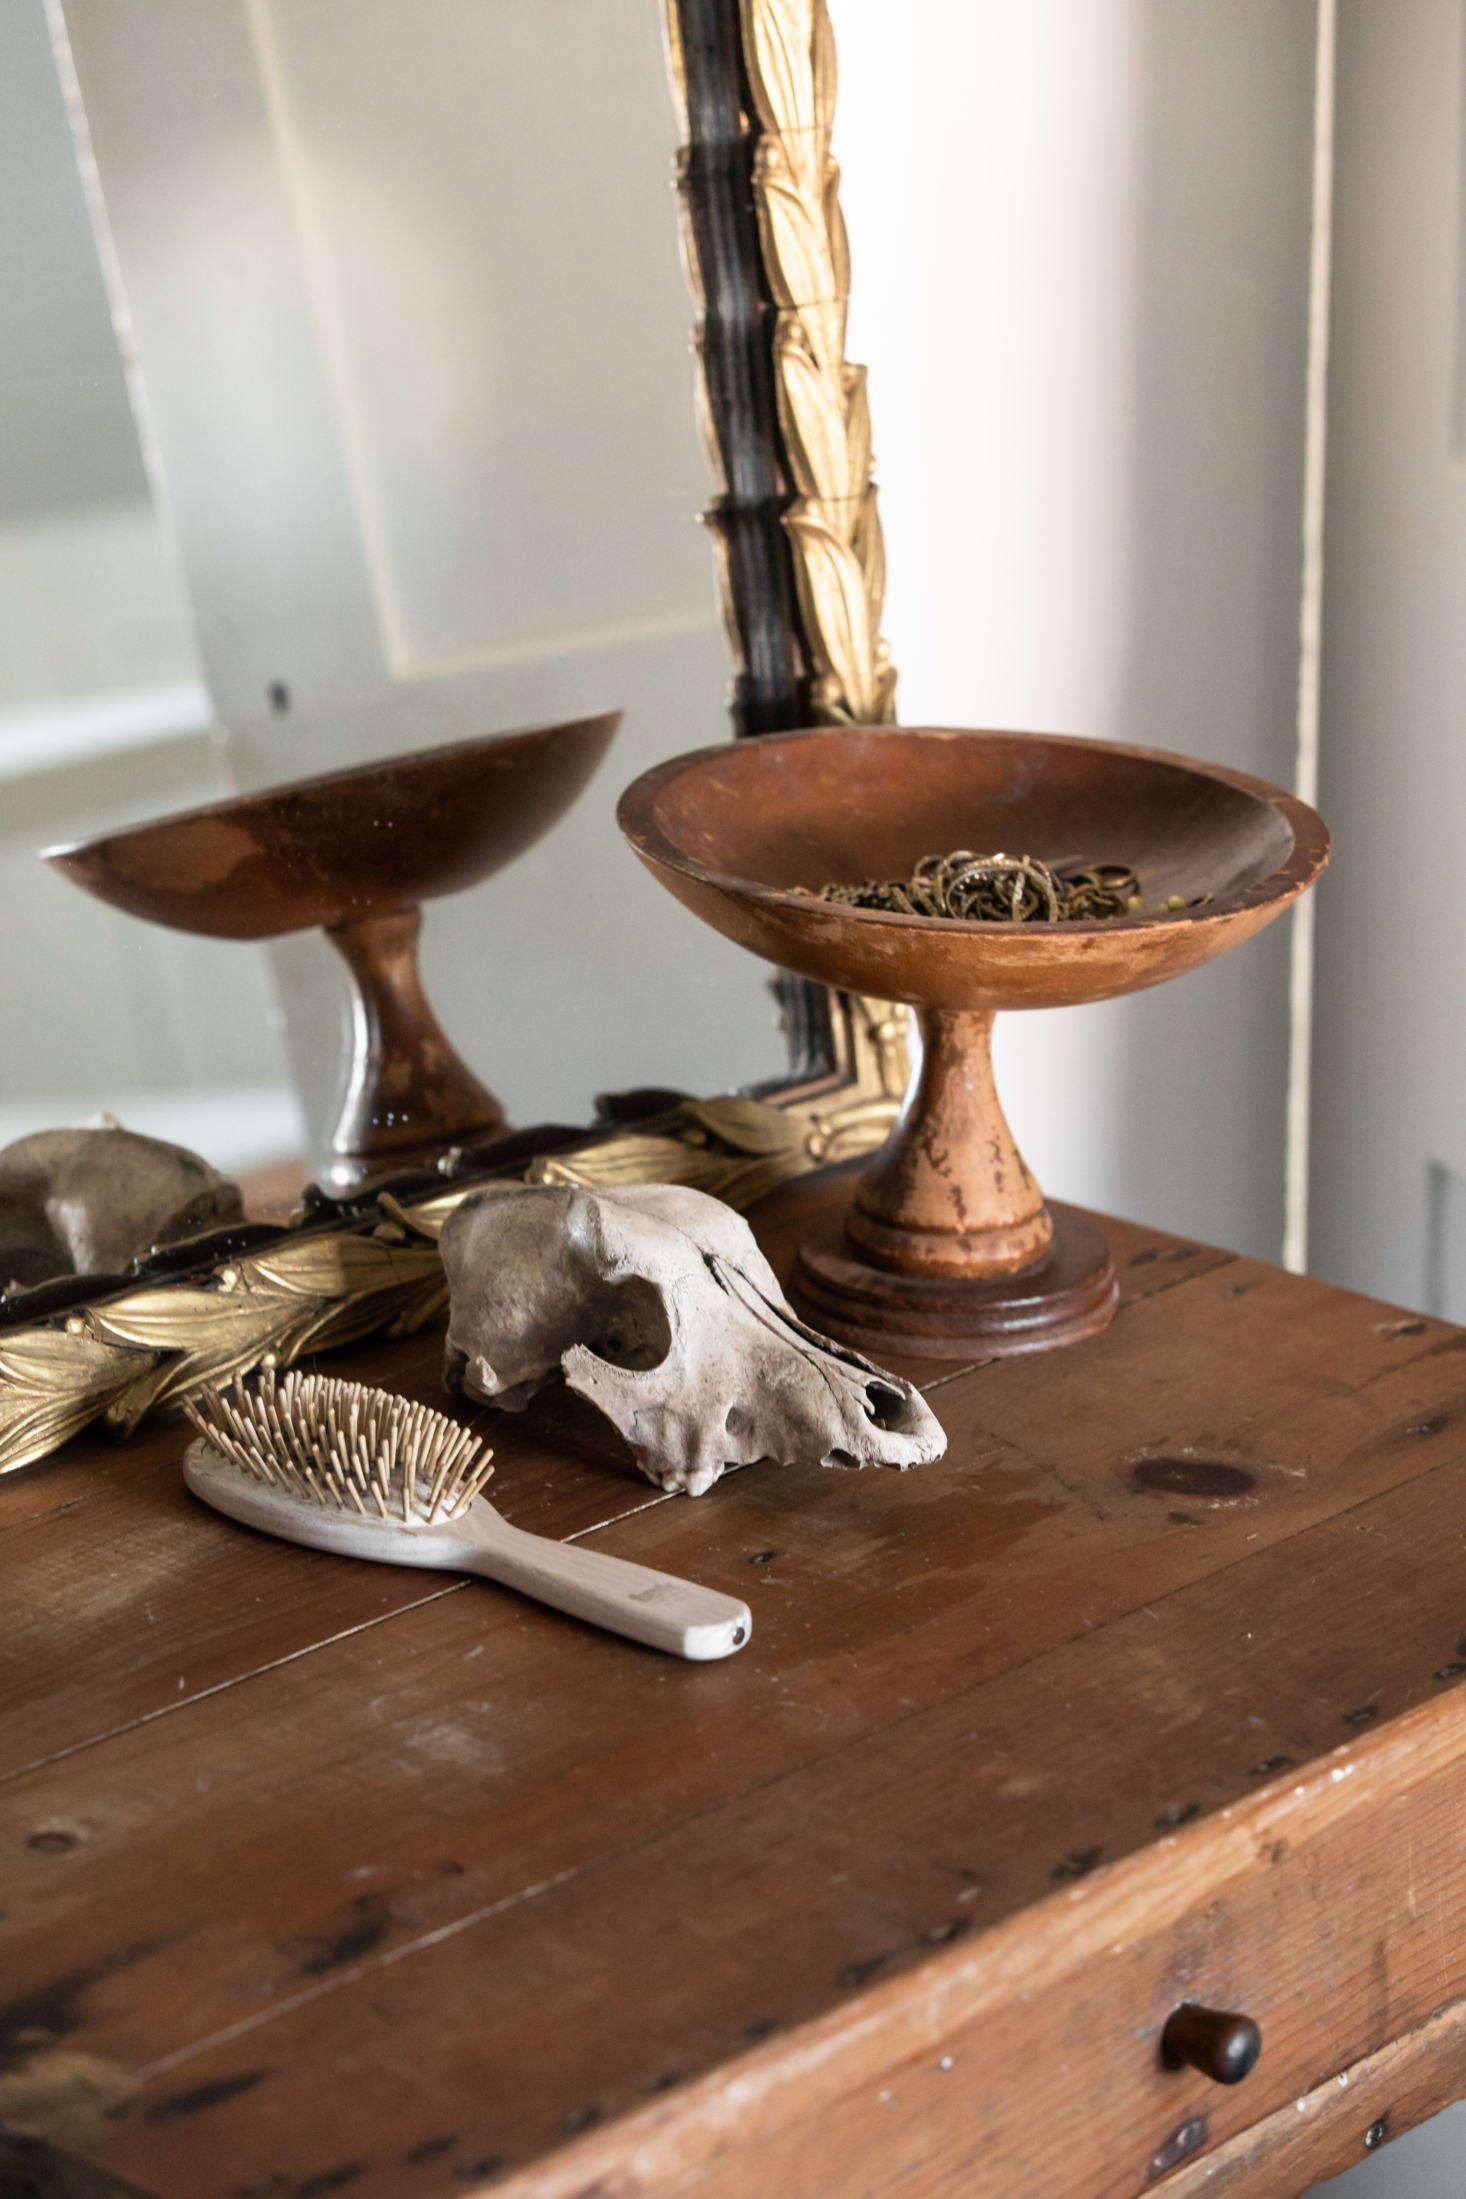 The House That Craigslist Built: A Bare-Bones Farmhouse in Midcoast